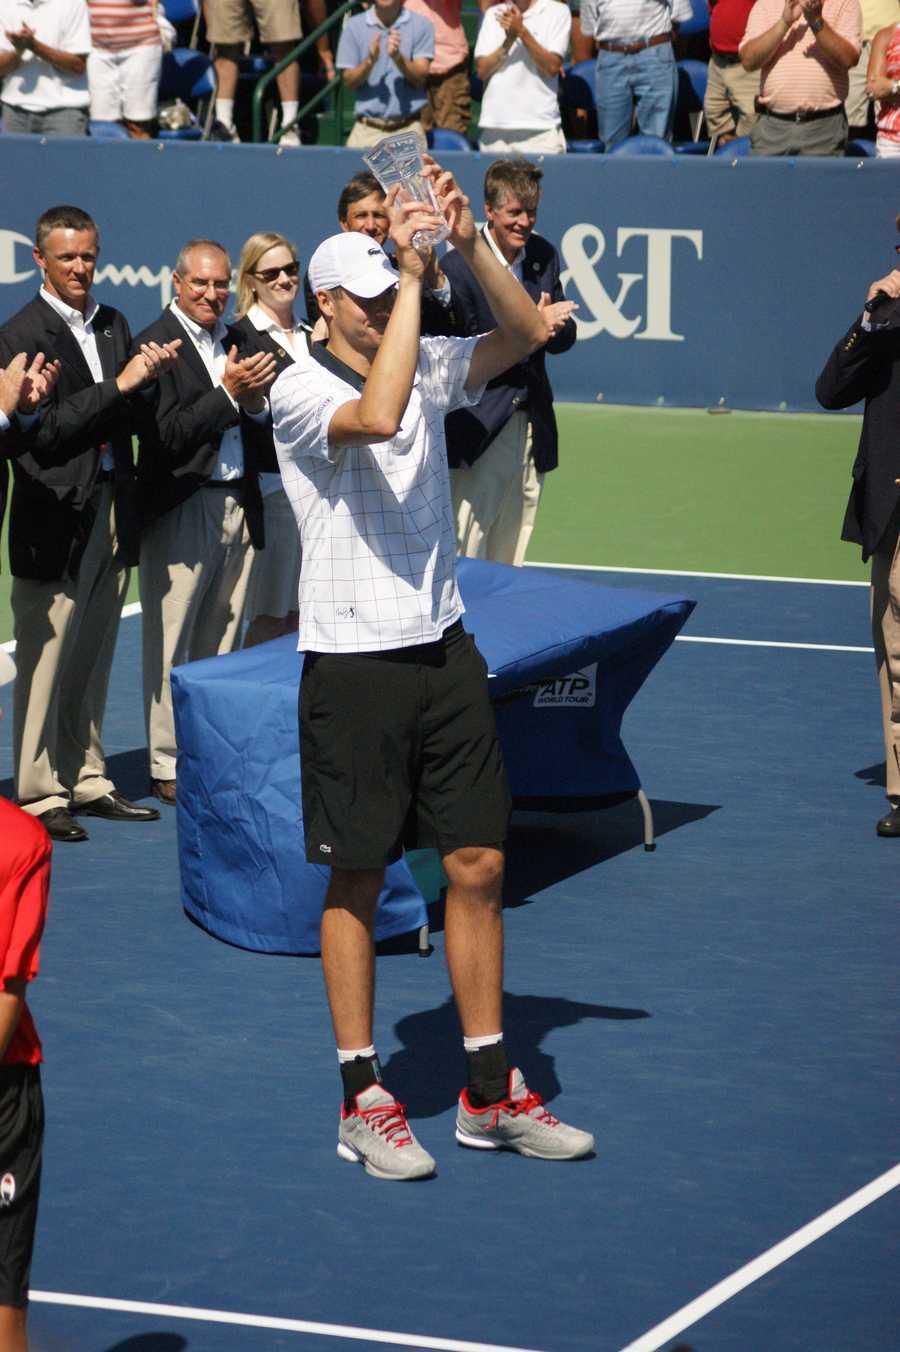 John Isner wins the 2012 Winston-Salem Open - photo by Taresh Moore